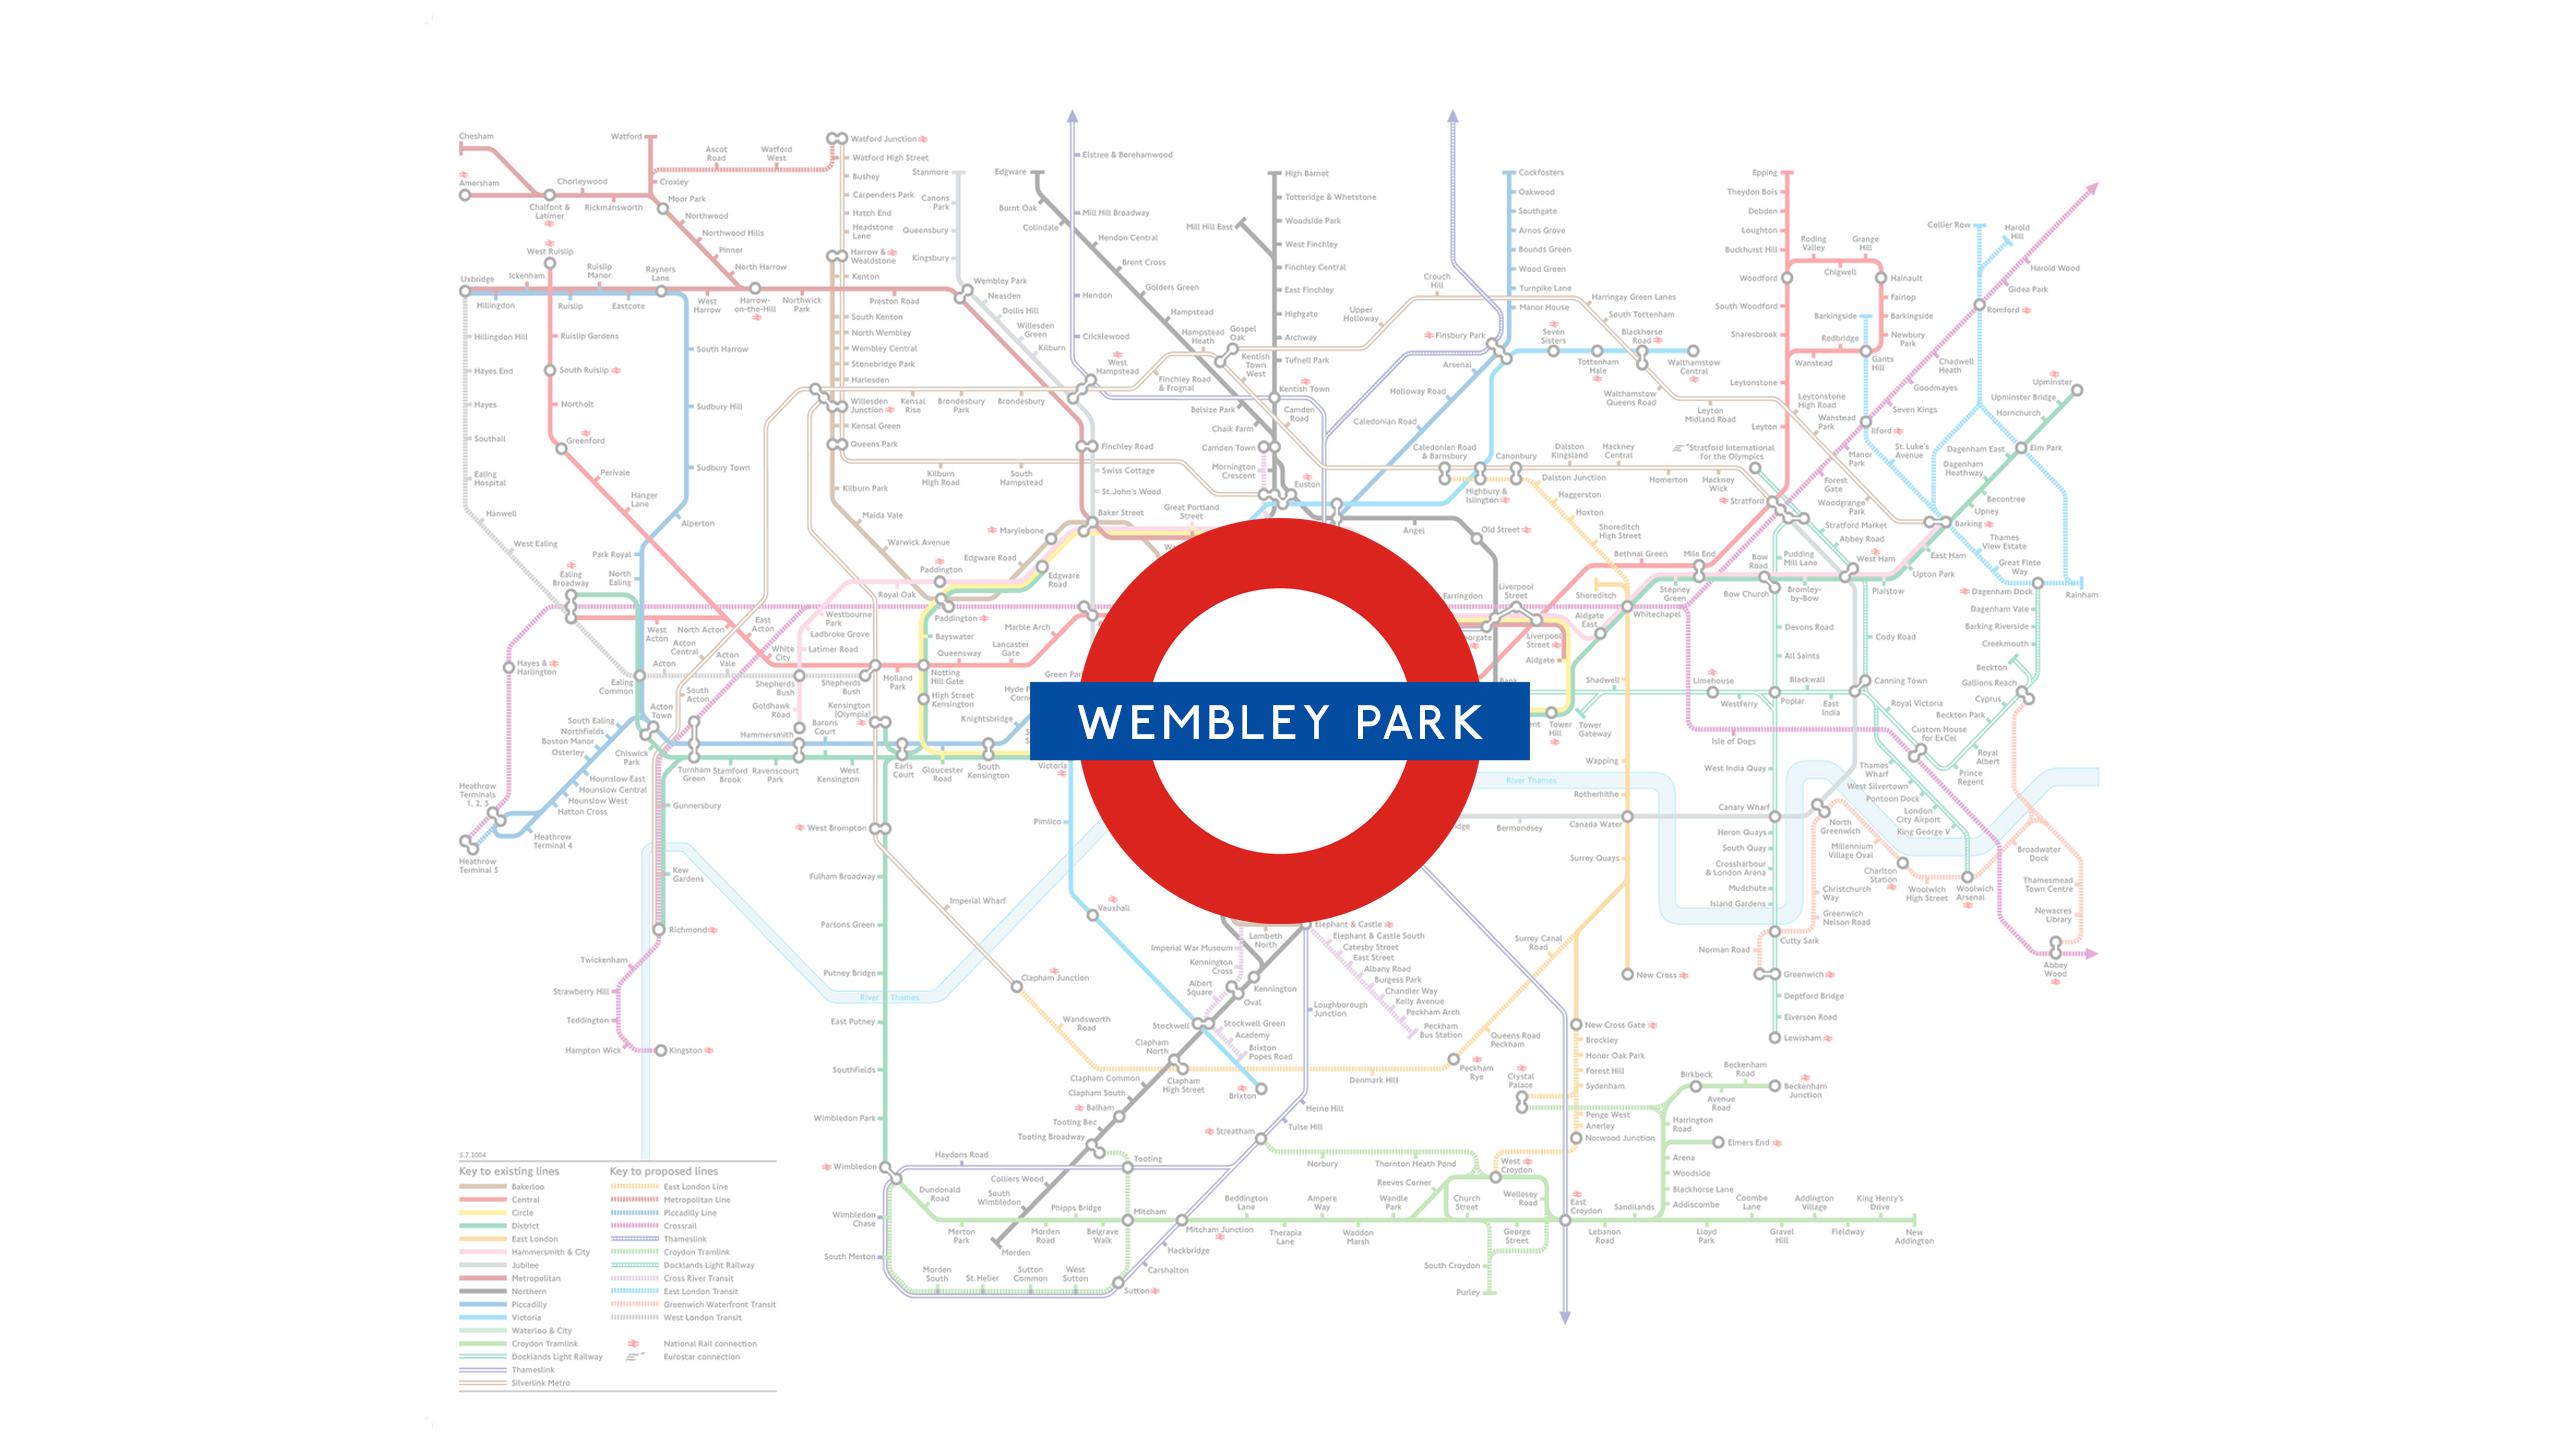 Wembley Park (Map)